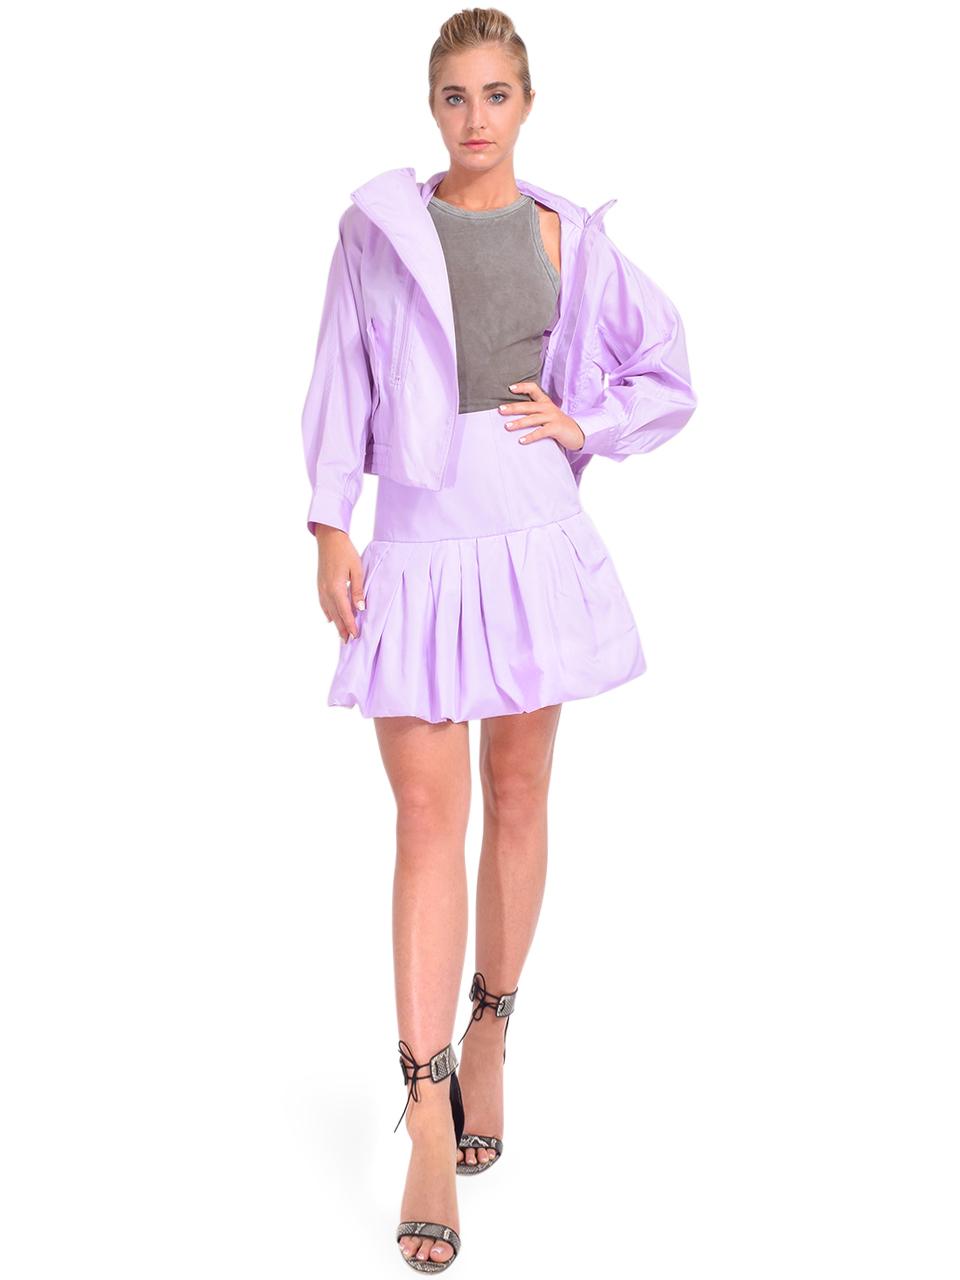 3.1 Phillip Lim Bubble Hem Taffeta Mini Skirt in Lavender Full Outfit